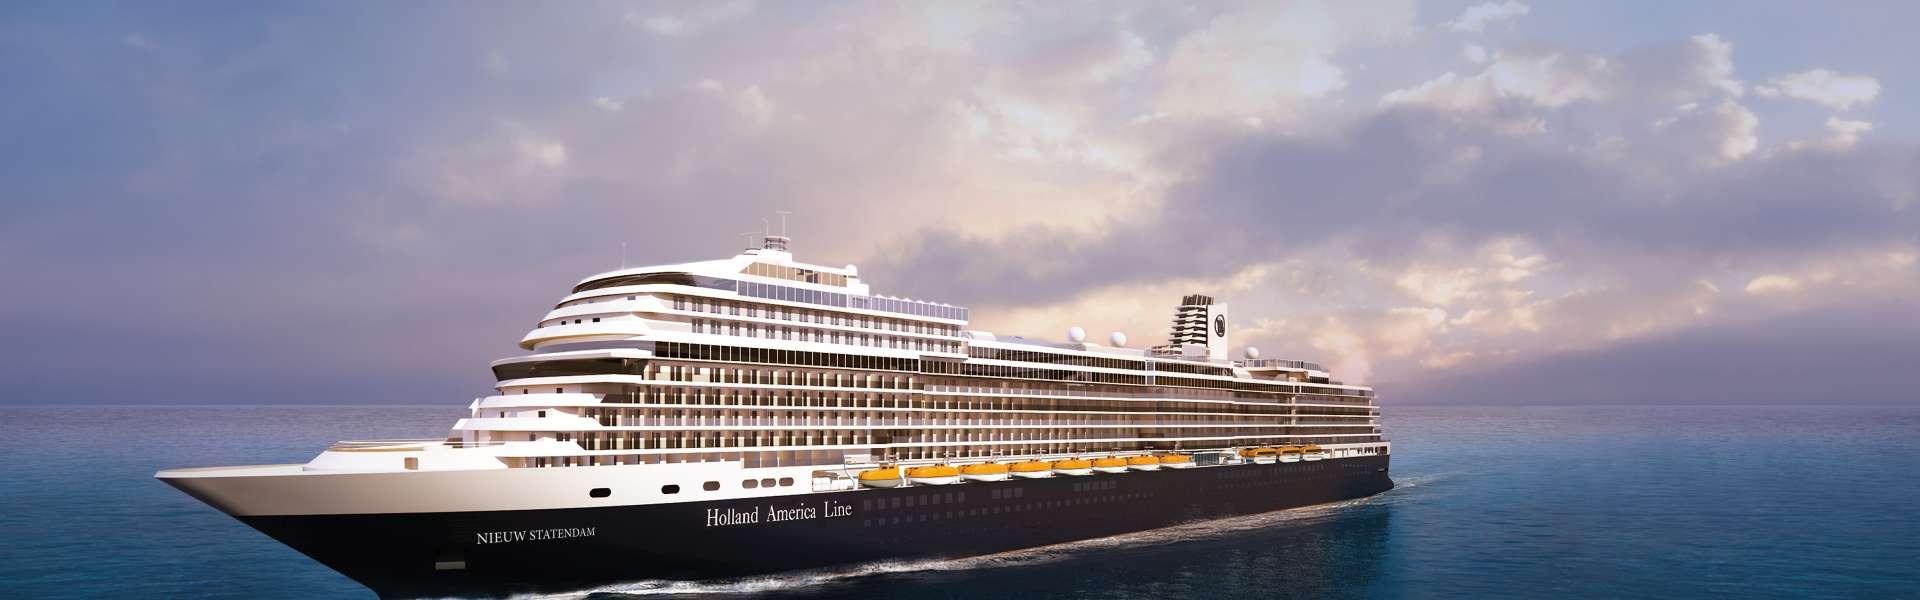 Croaziera 2019 - Caraibele de Est (Fort Lauderdale) - Holland America Line - Nieuw Statendam - 7 nopti